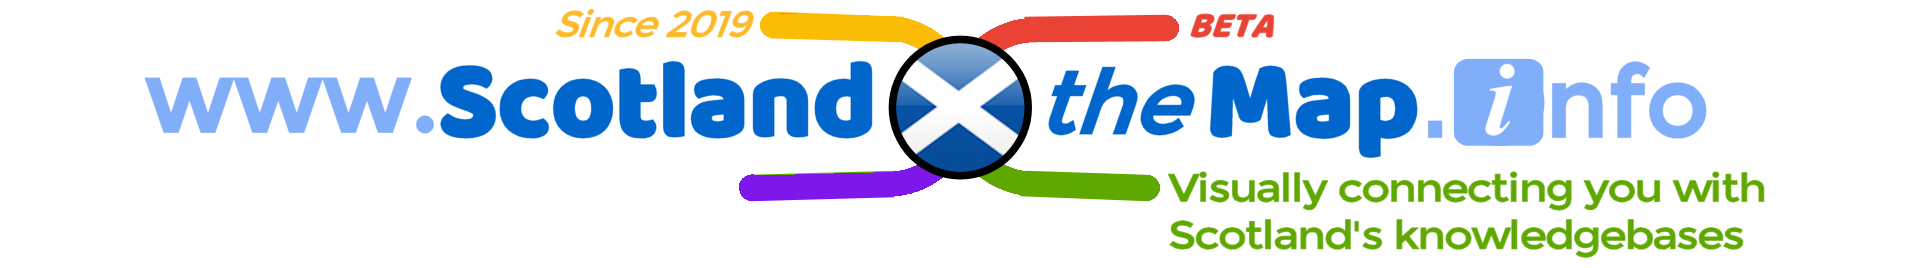 Scotland the Map